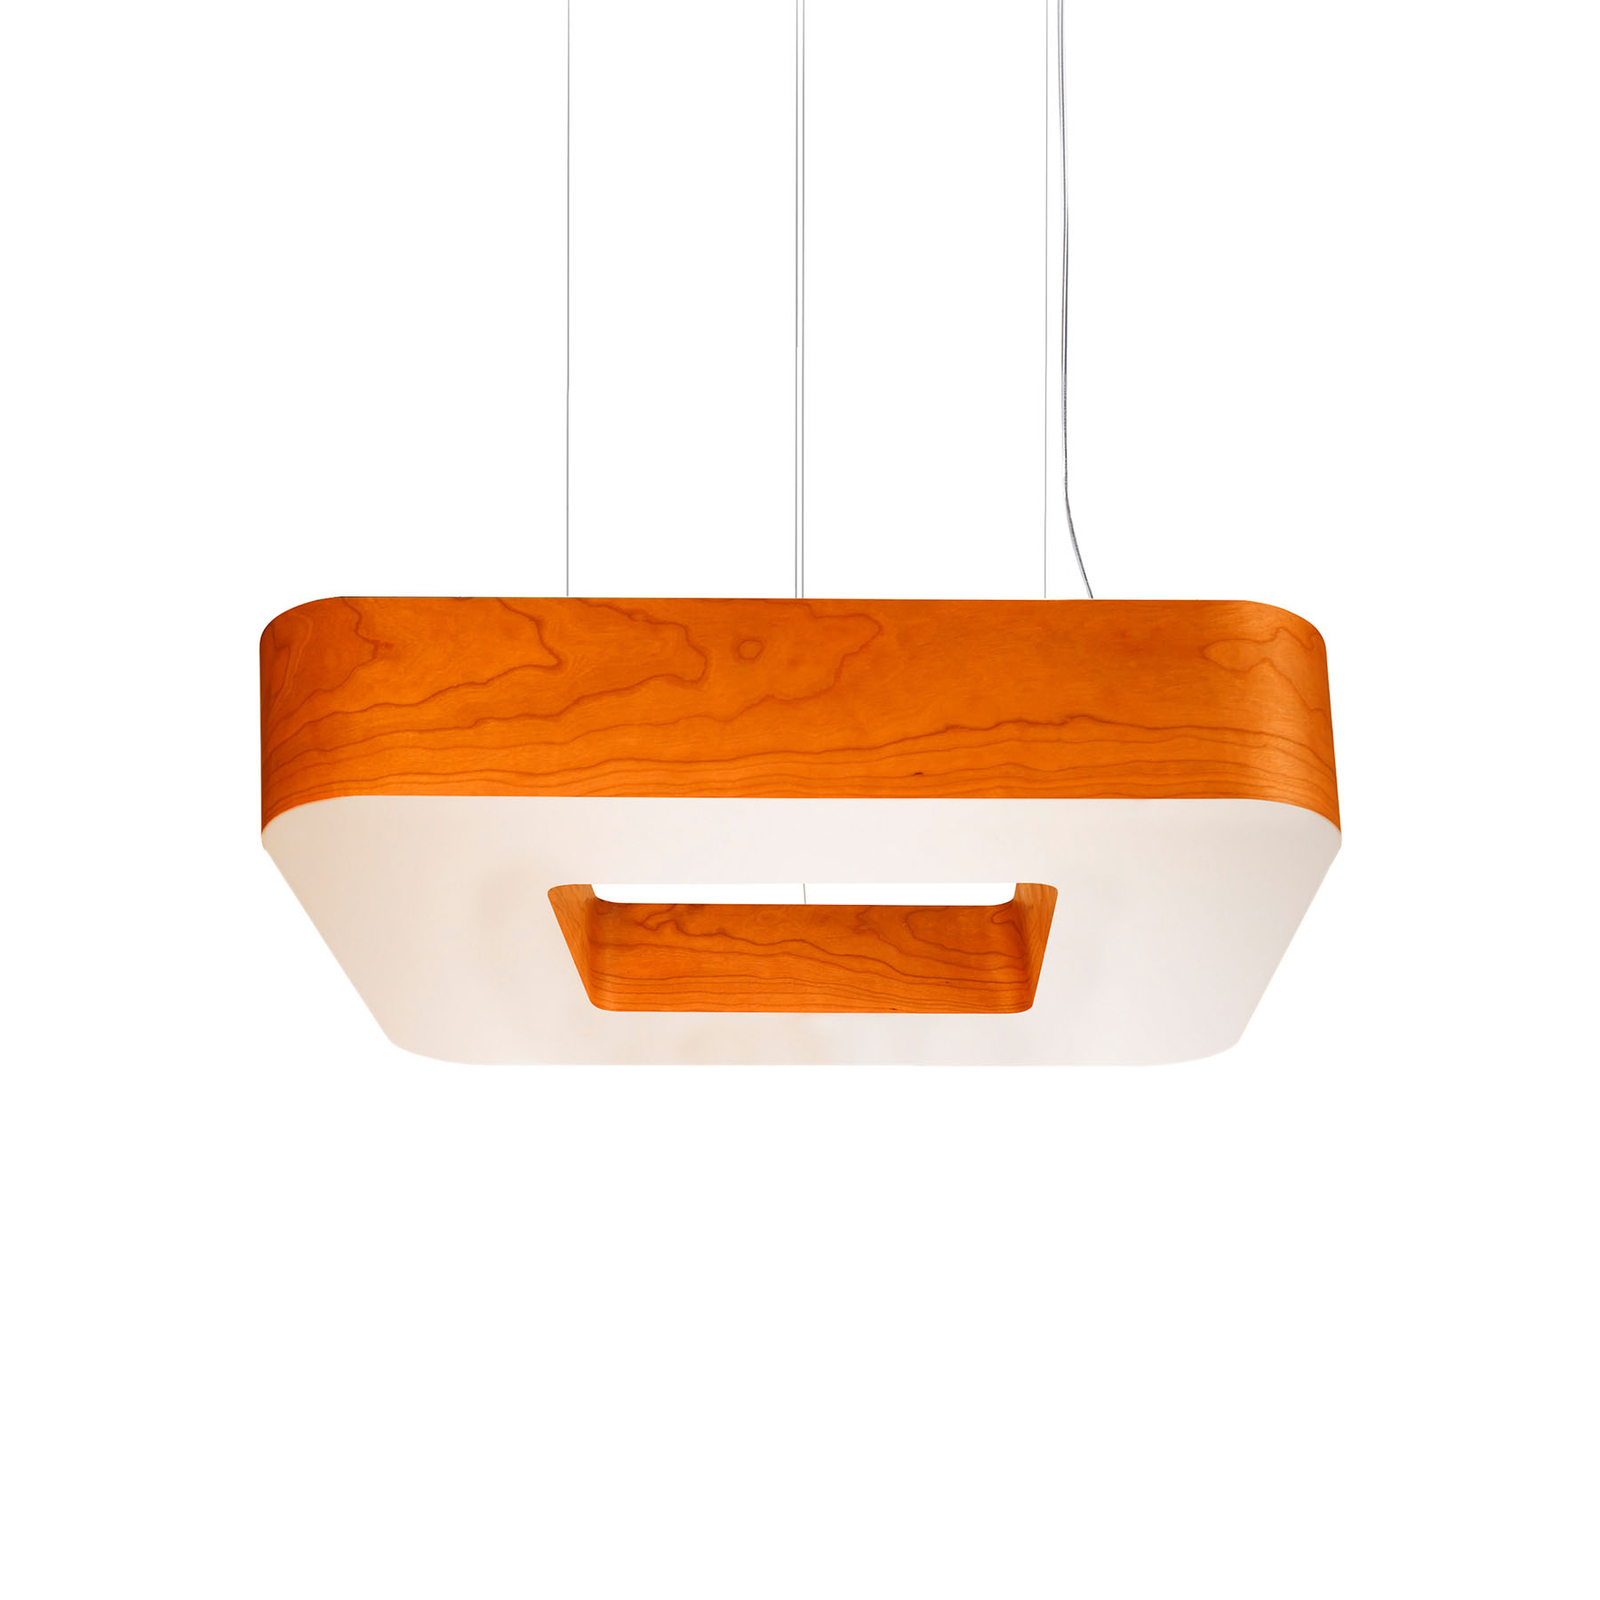 LZF Cuad LED-Hängeleuchte 0-10V dim, orange